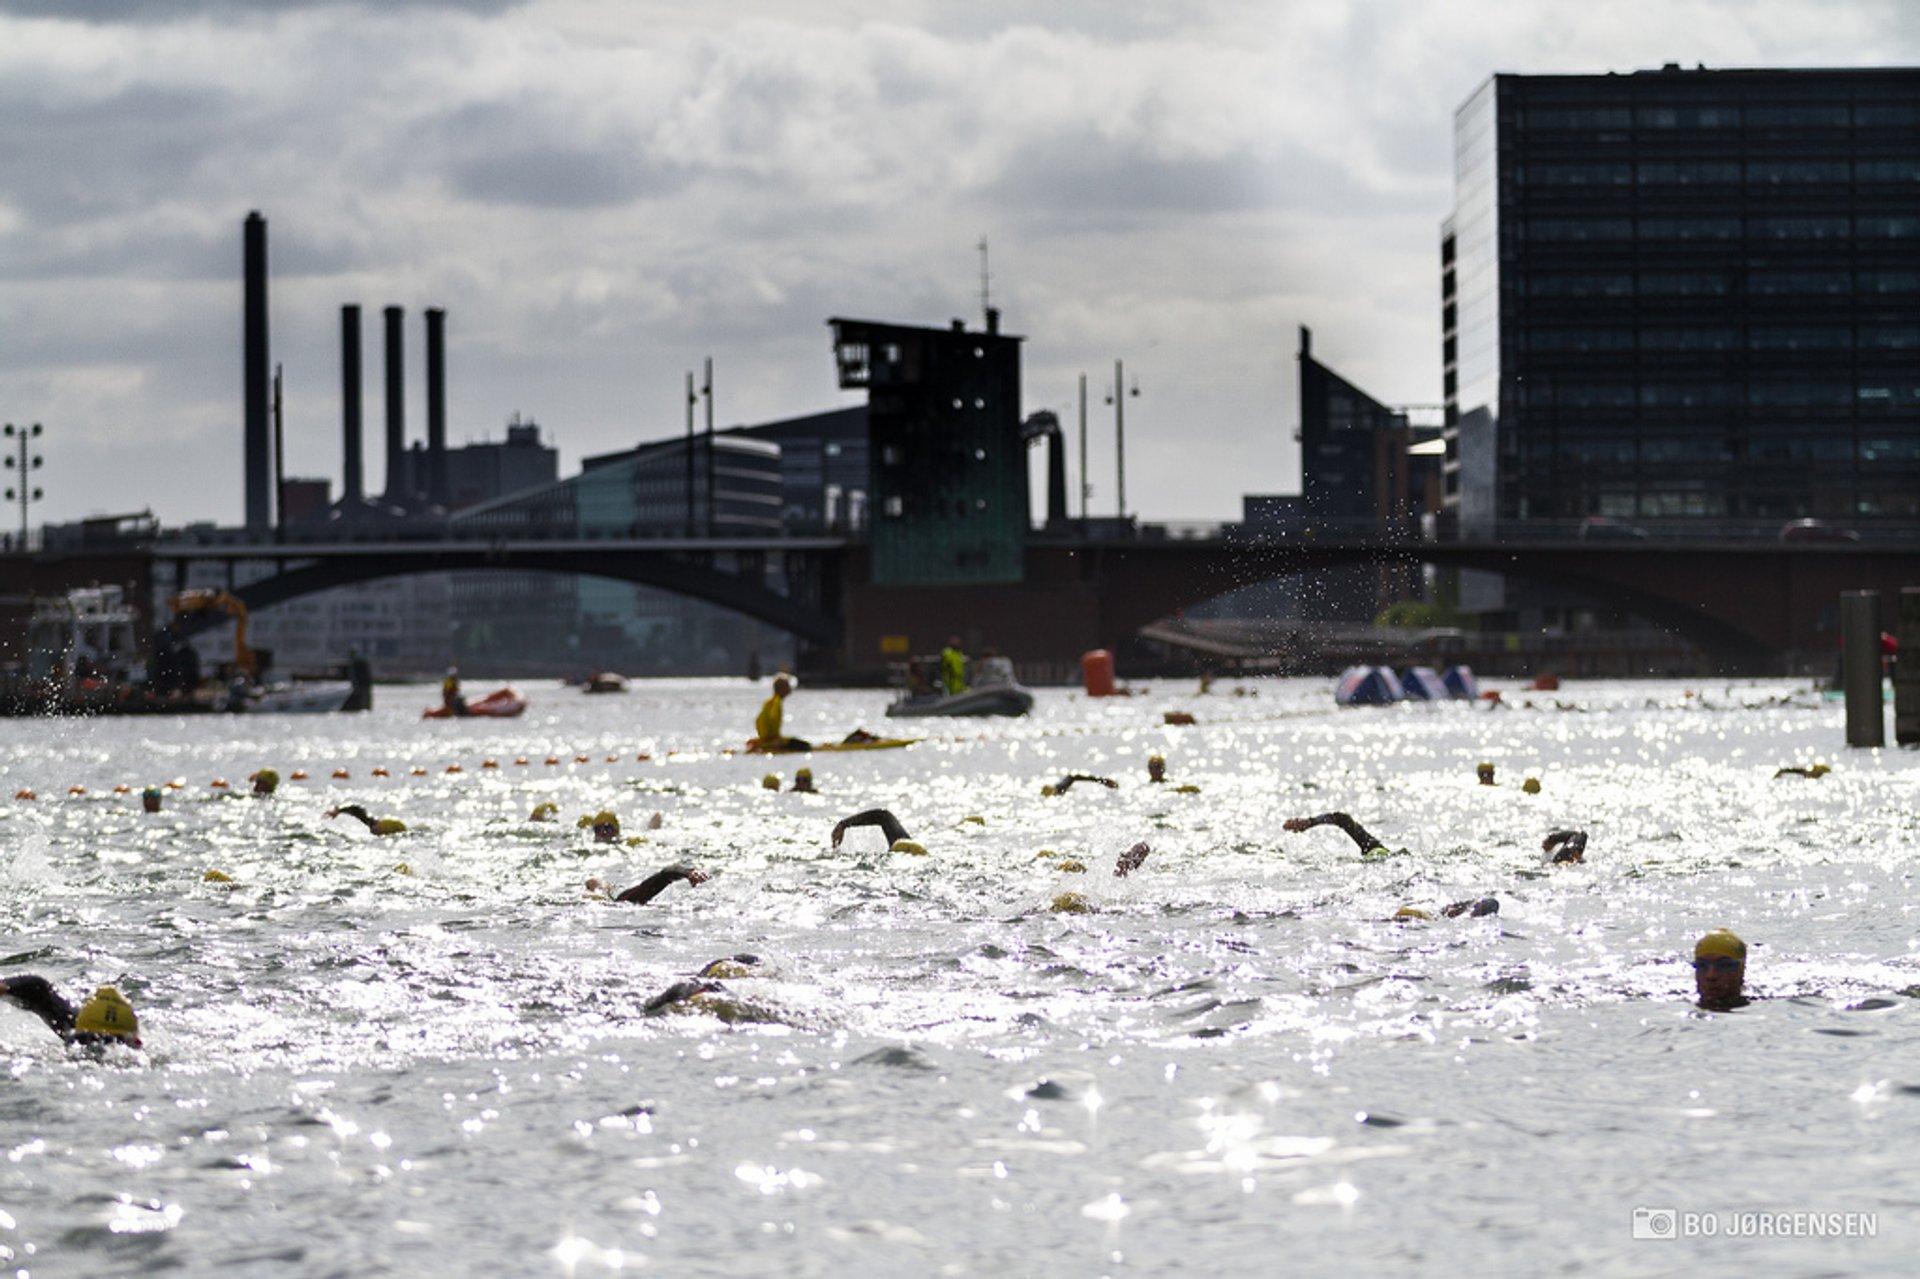 TrygFonden Christiansborg Rundt Copenhagen Swim in Copenhagen - Best Season 2020